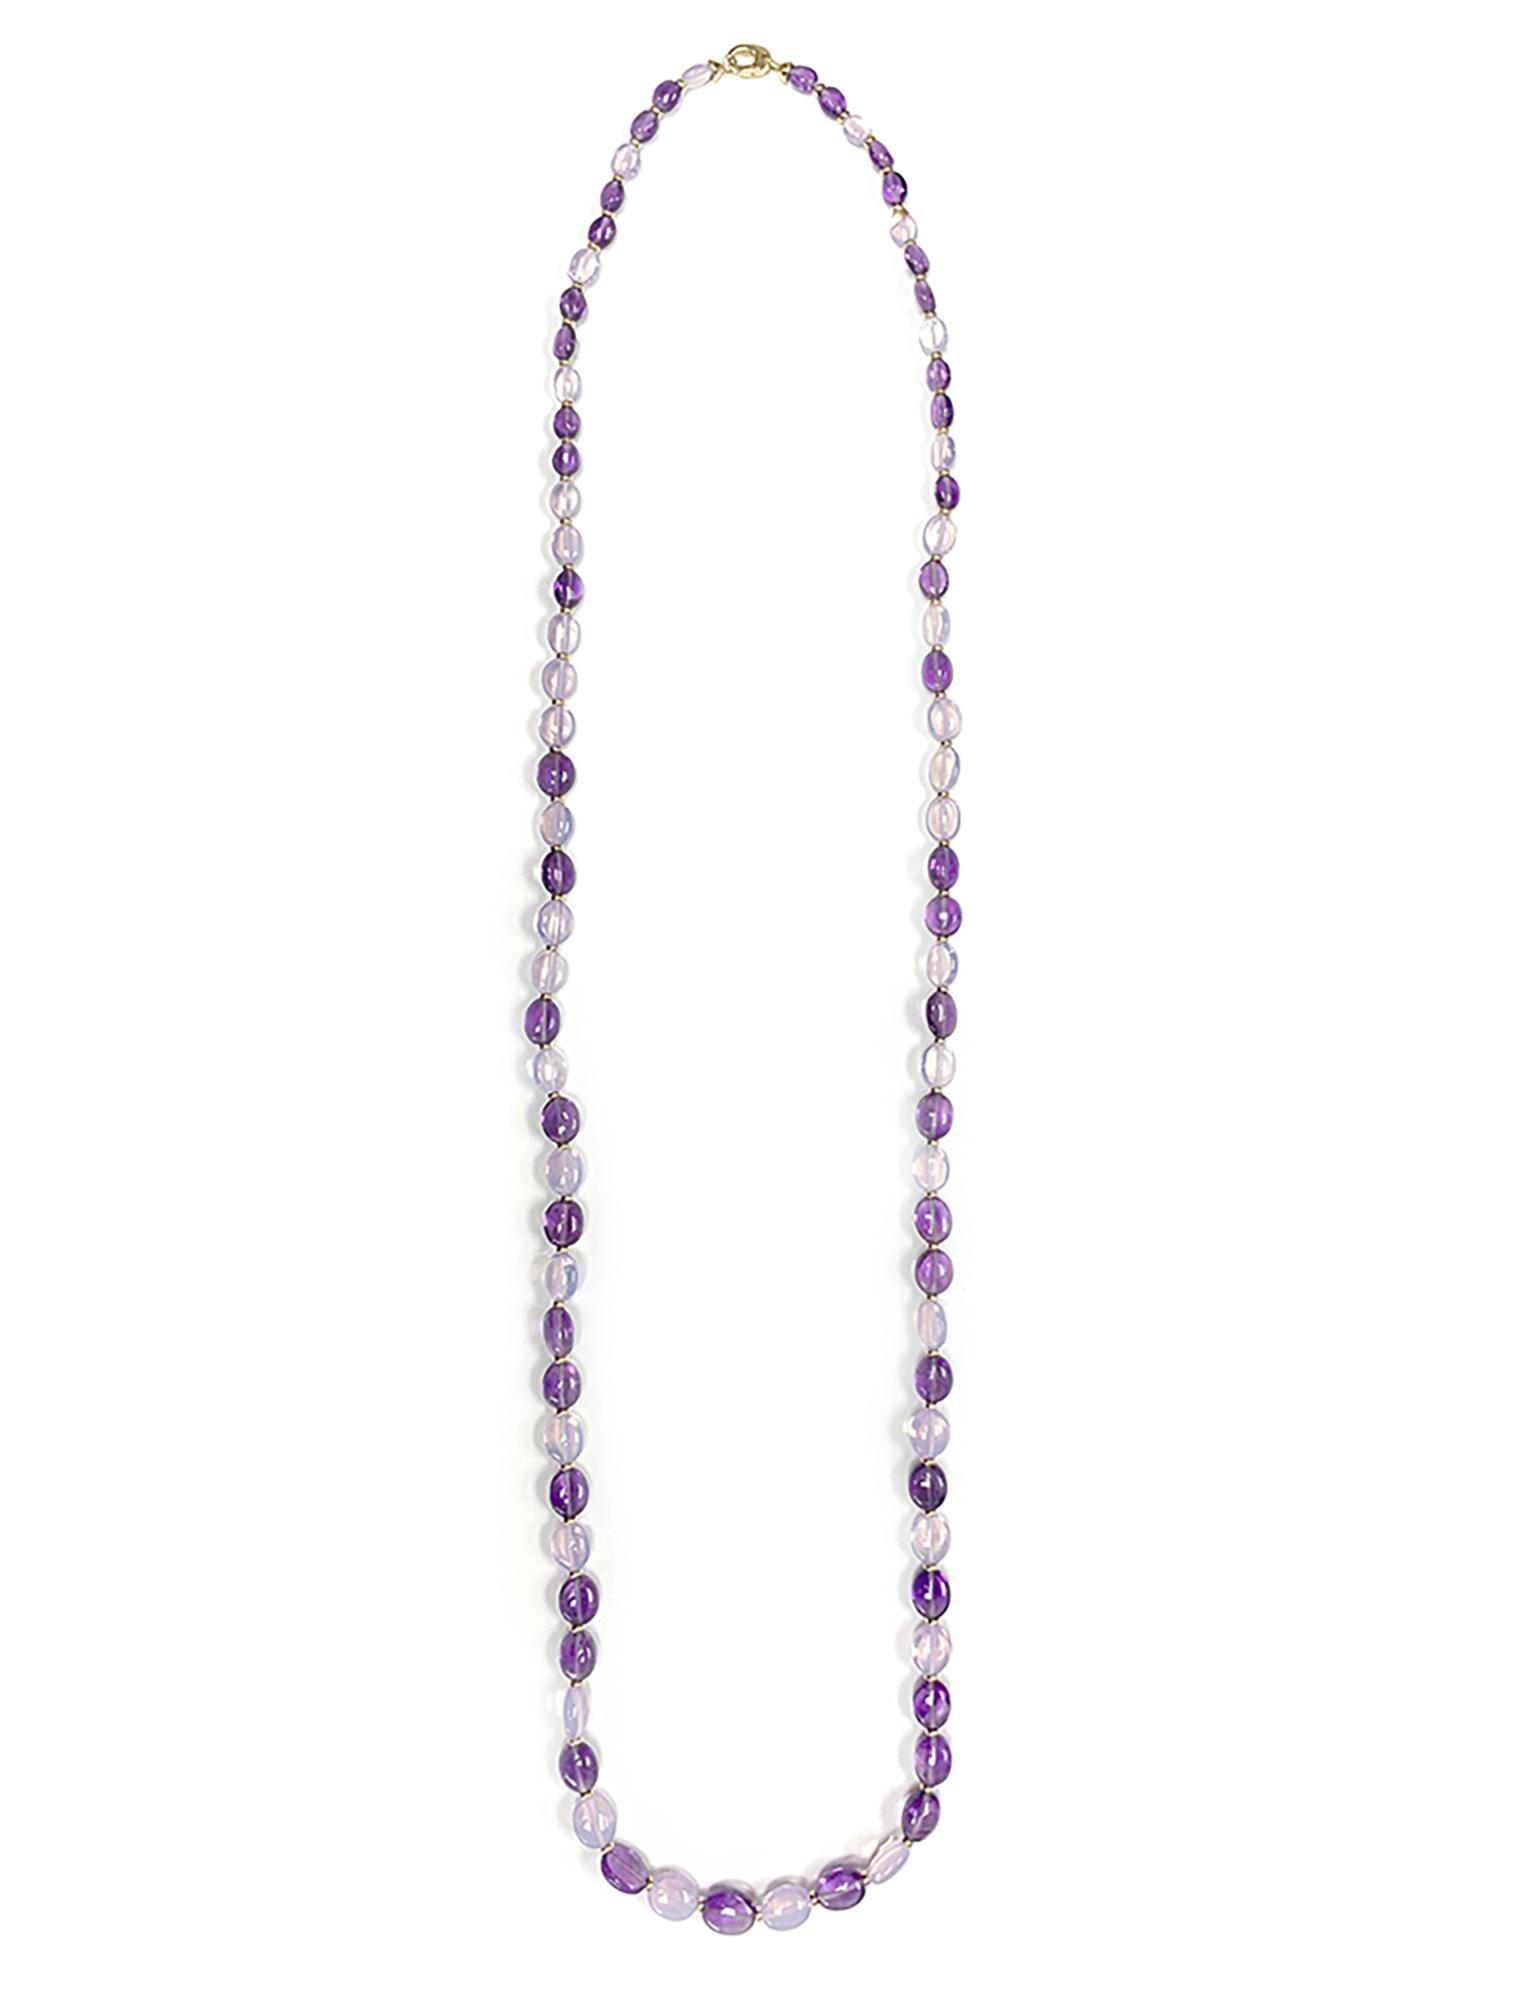 Lavender Moon Quartz : lavender, quartz, Goshwara, 1-Strand, Amethyst, Lavender, Quartz, Tumbled, Beads, Necklace, 1stDibs